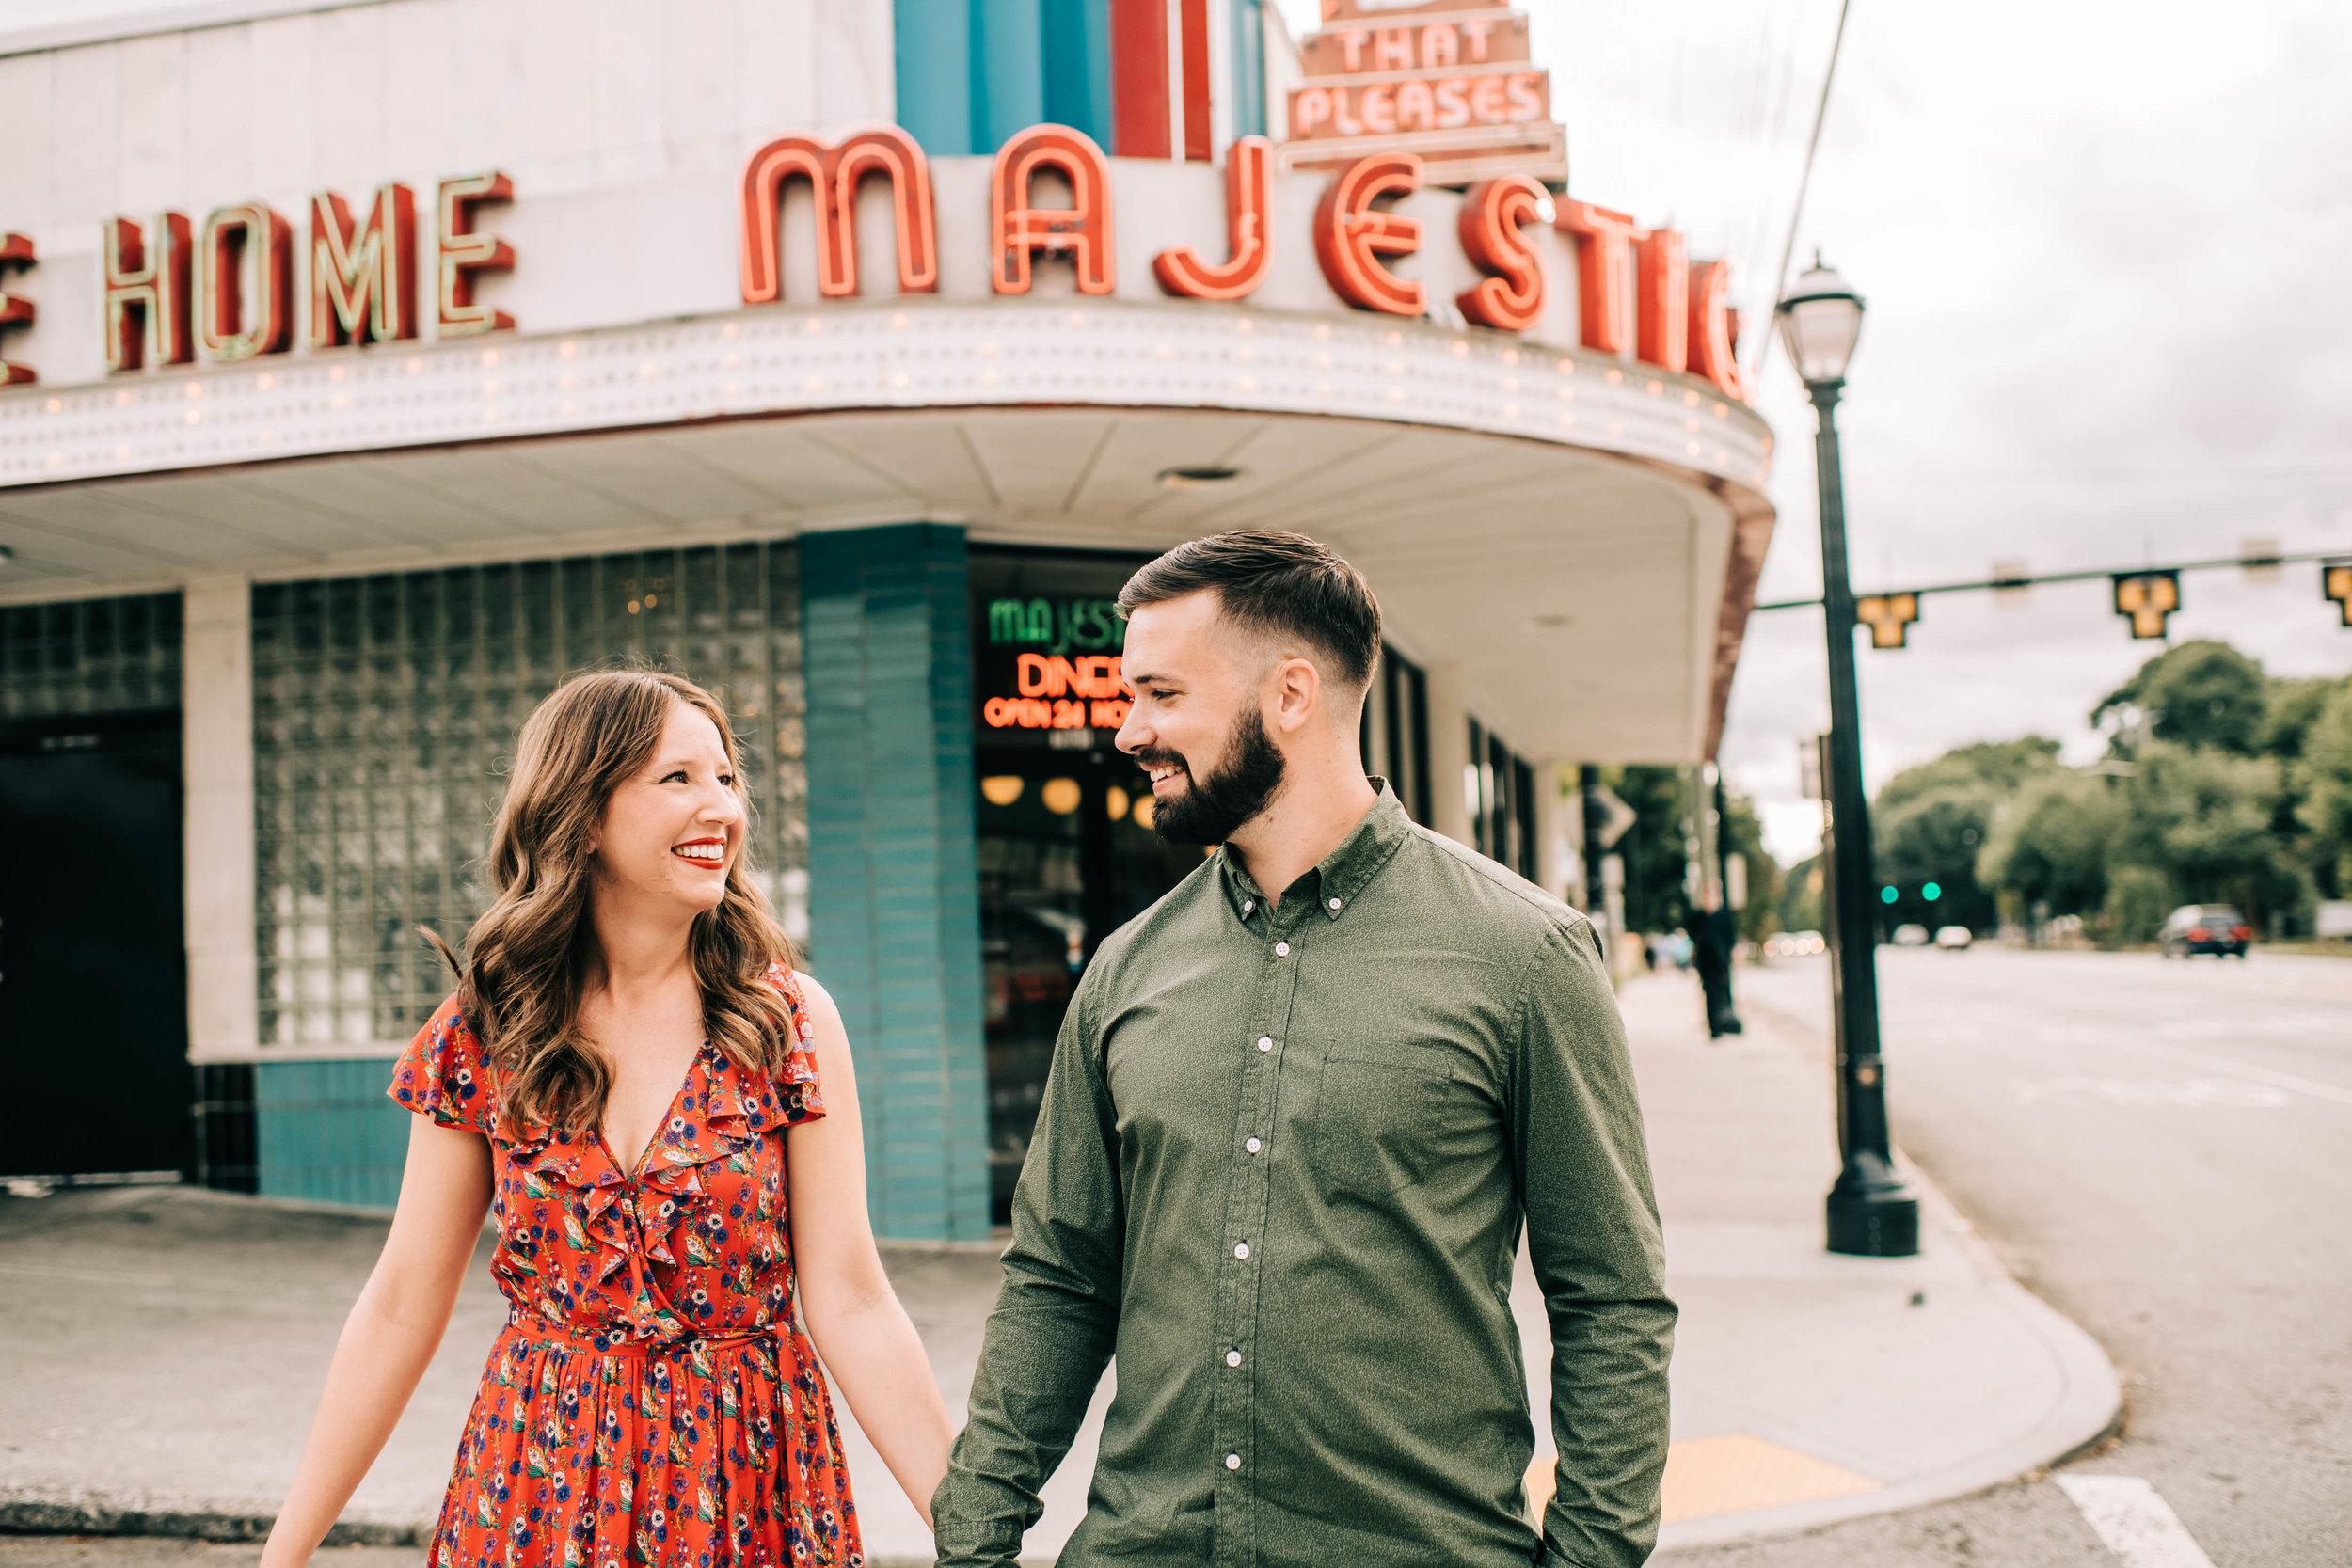 san francisco oakland bay area california sf atlanta georgia majestic diner ponce eastside beltline jackson street bridge atlanta skyline weloveatl engagement nontraditional wedding photographer -44.jpg